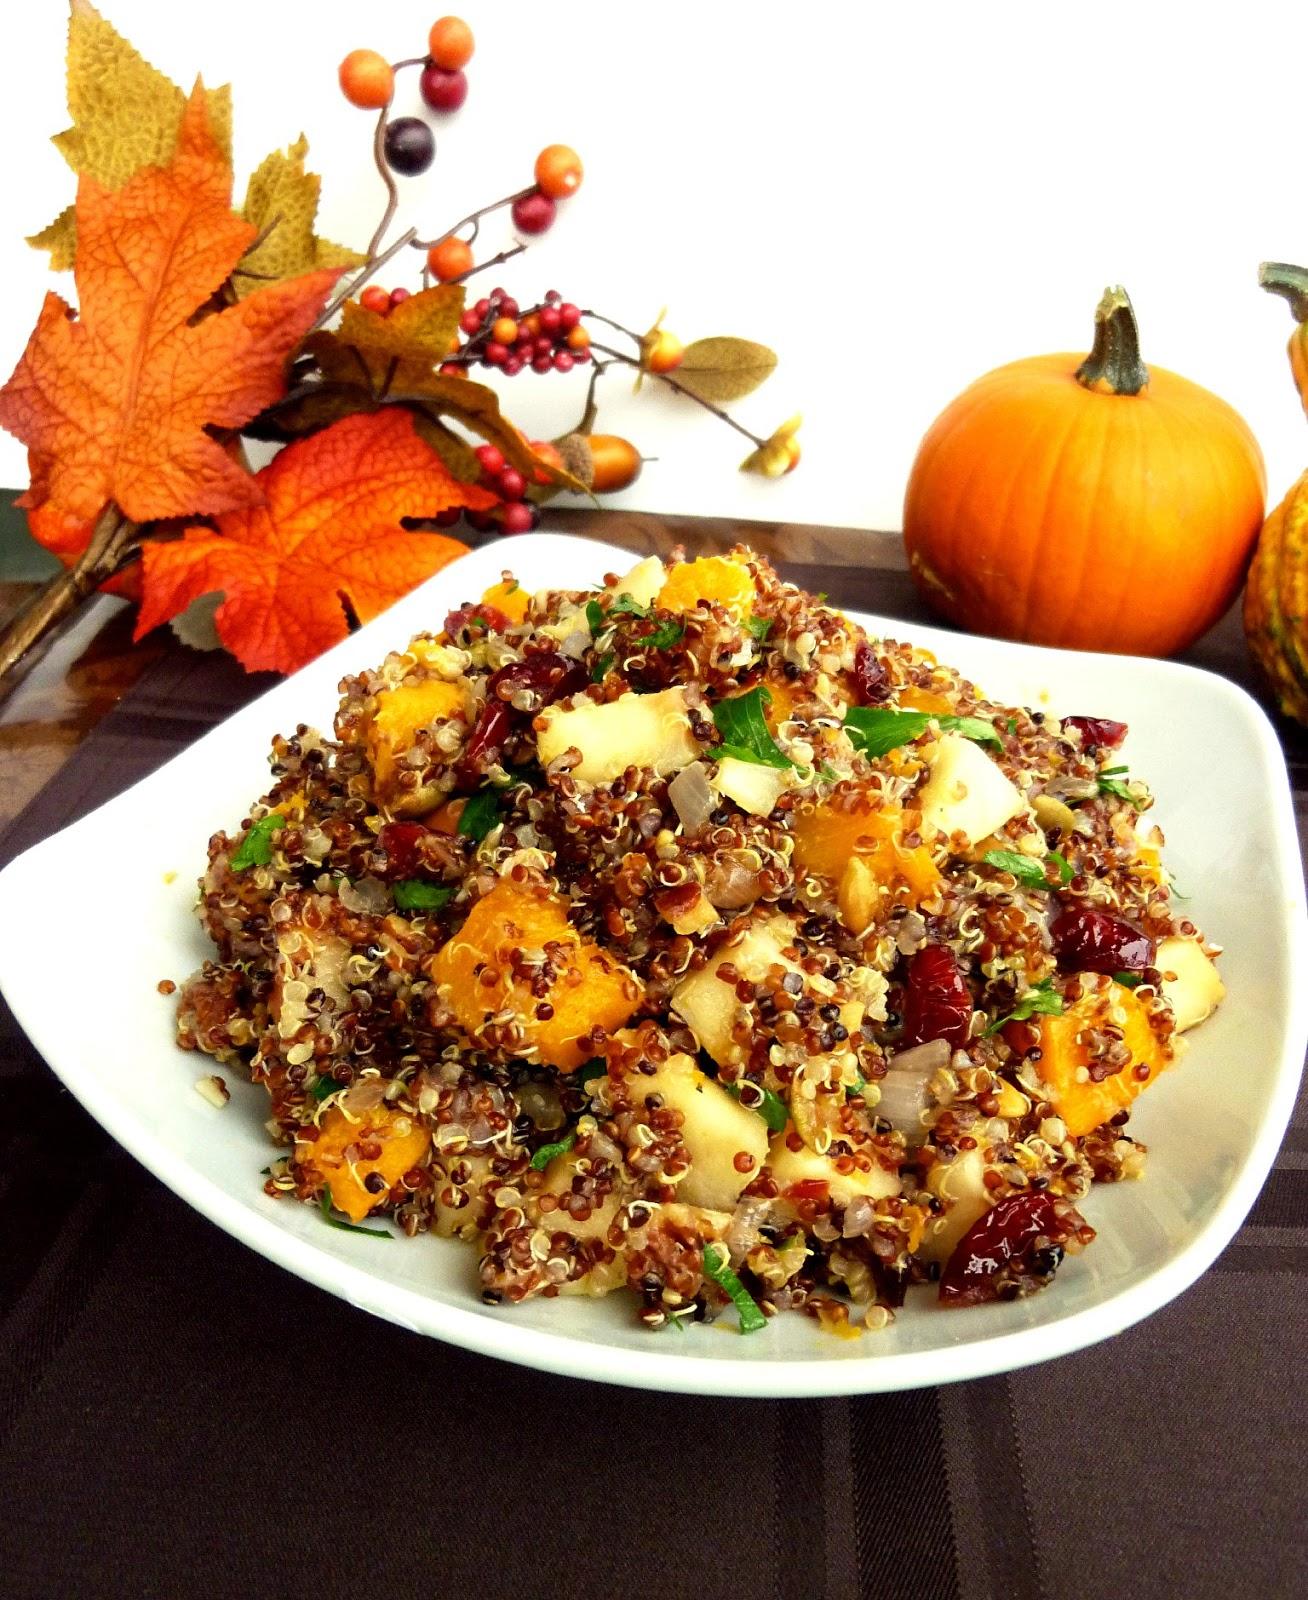 Vanilla & Spice: Recipes For A Vegetarian Thanksgiving